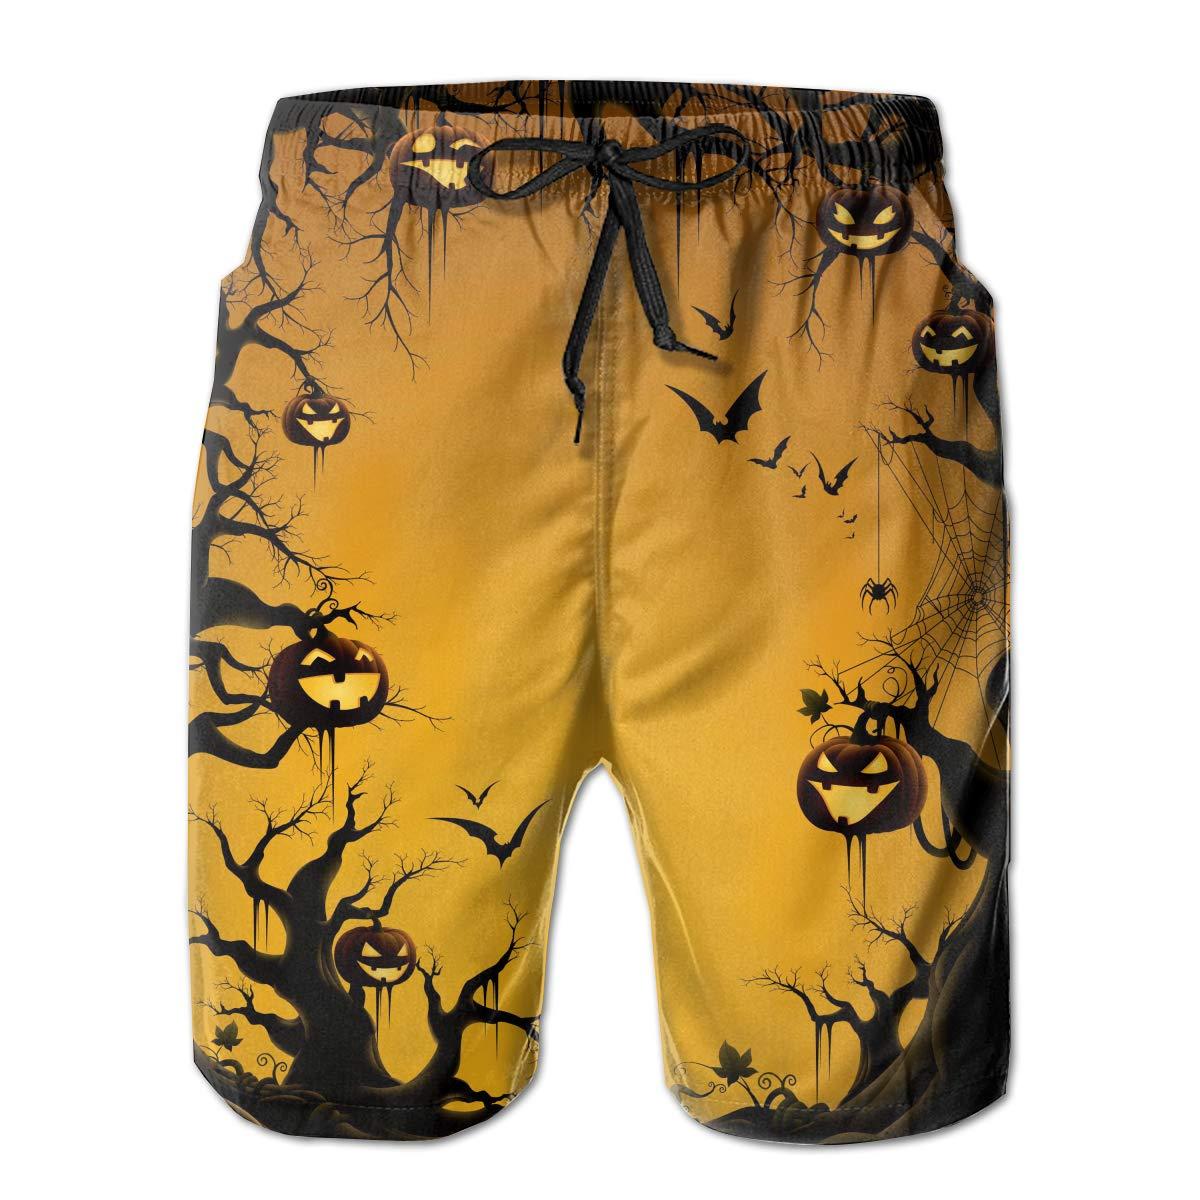 Wexzss Happy Halloween Funny Summer Quick-Drying Swim Trunks Beach Shorts Cargo Shorts